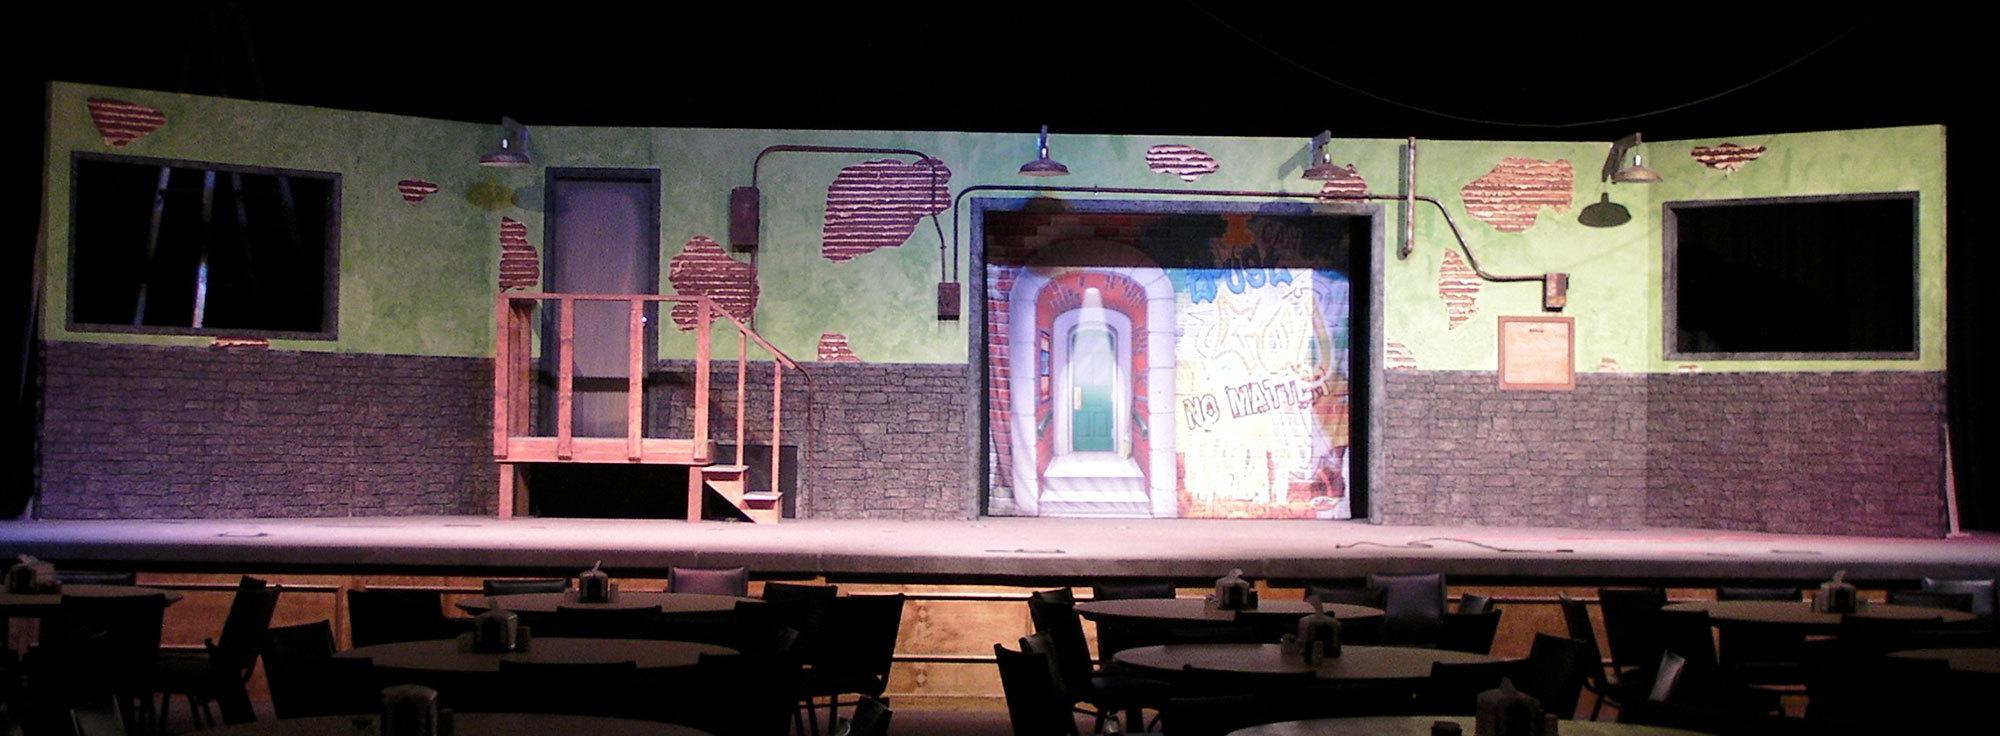 Big City Themed Stage Set